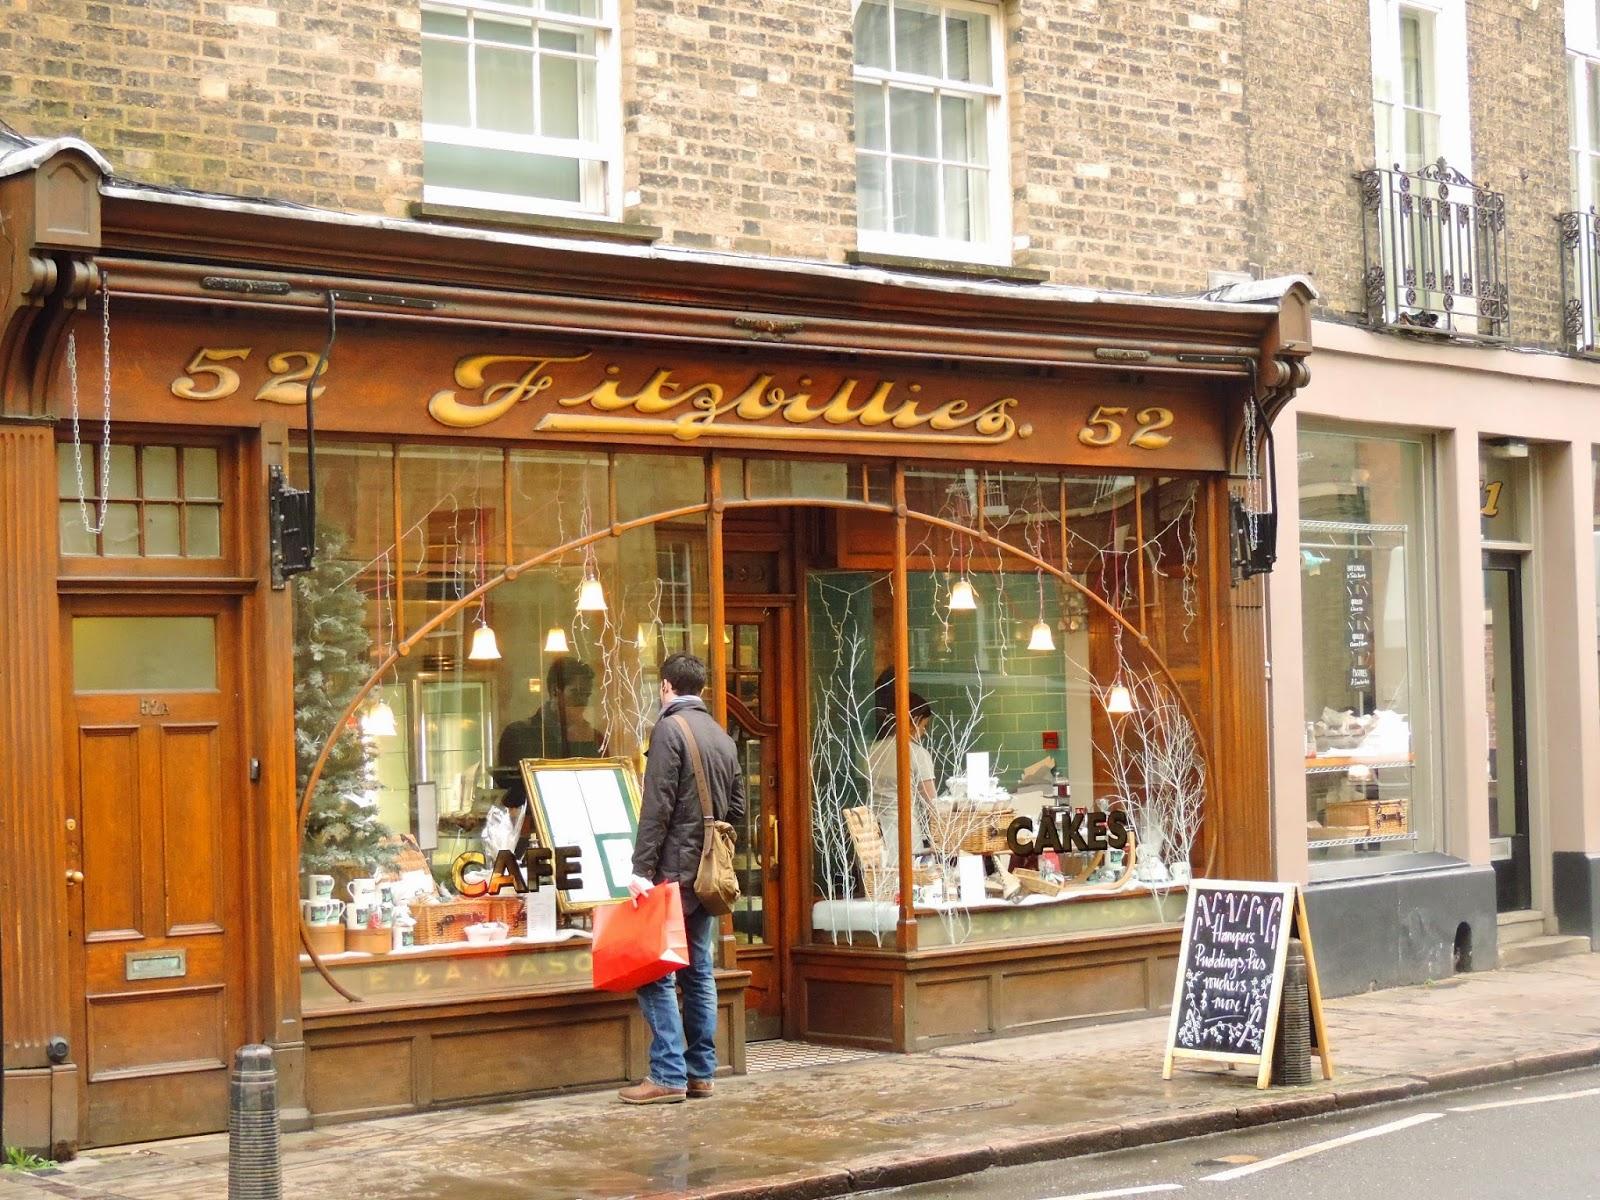 Fitzbillies cafe, Cambridge